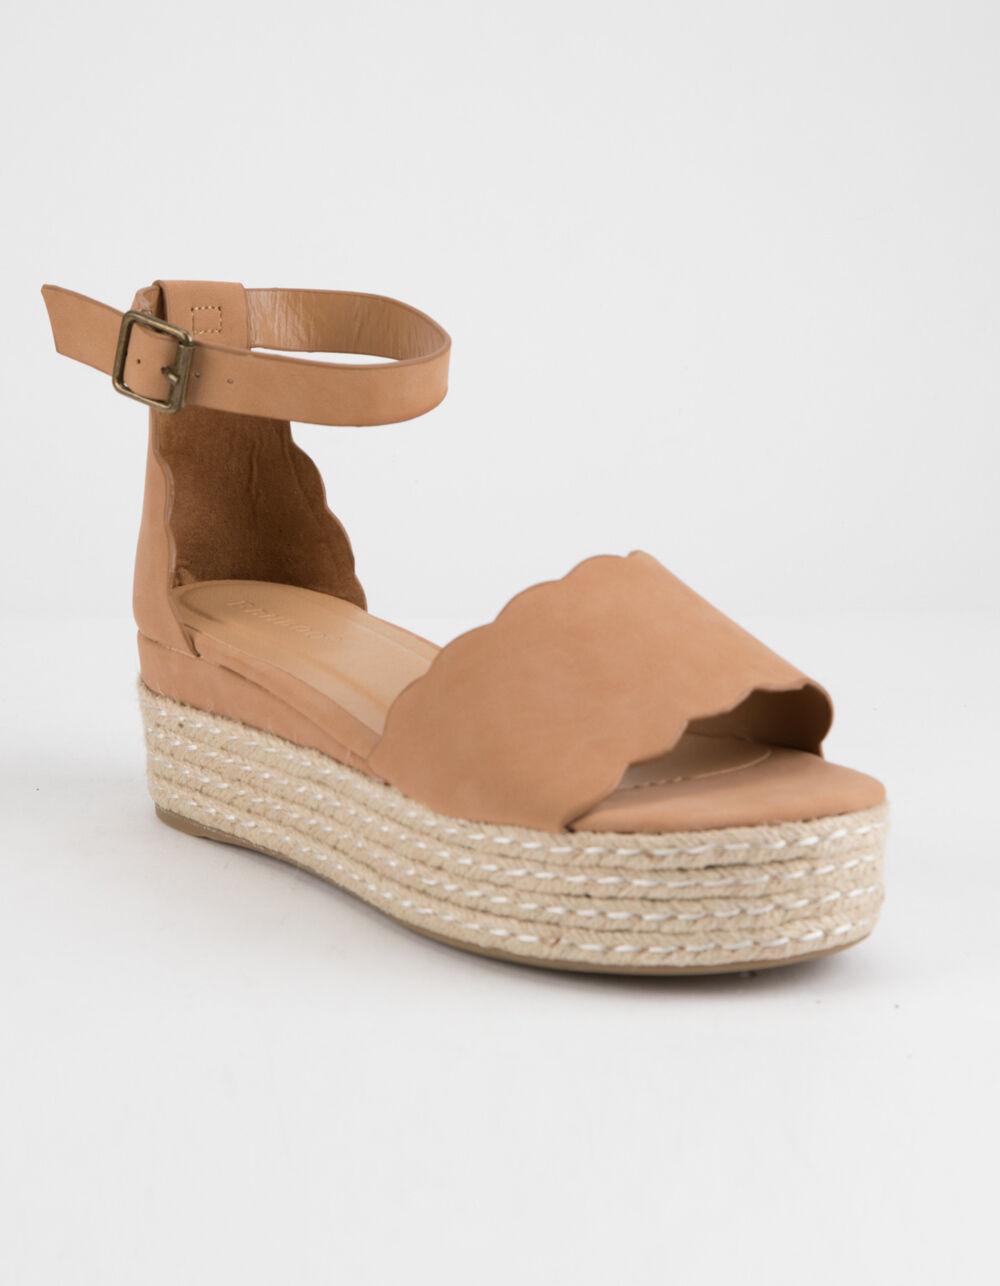 BAMBOO Scallop Espadrille Tan Platform Sandals